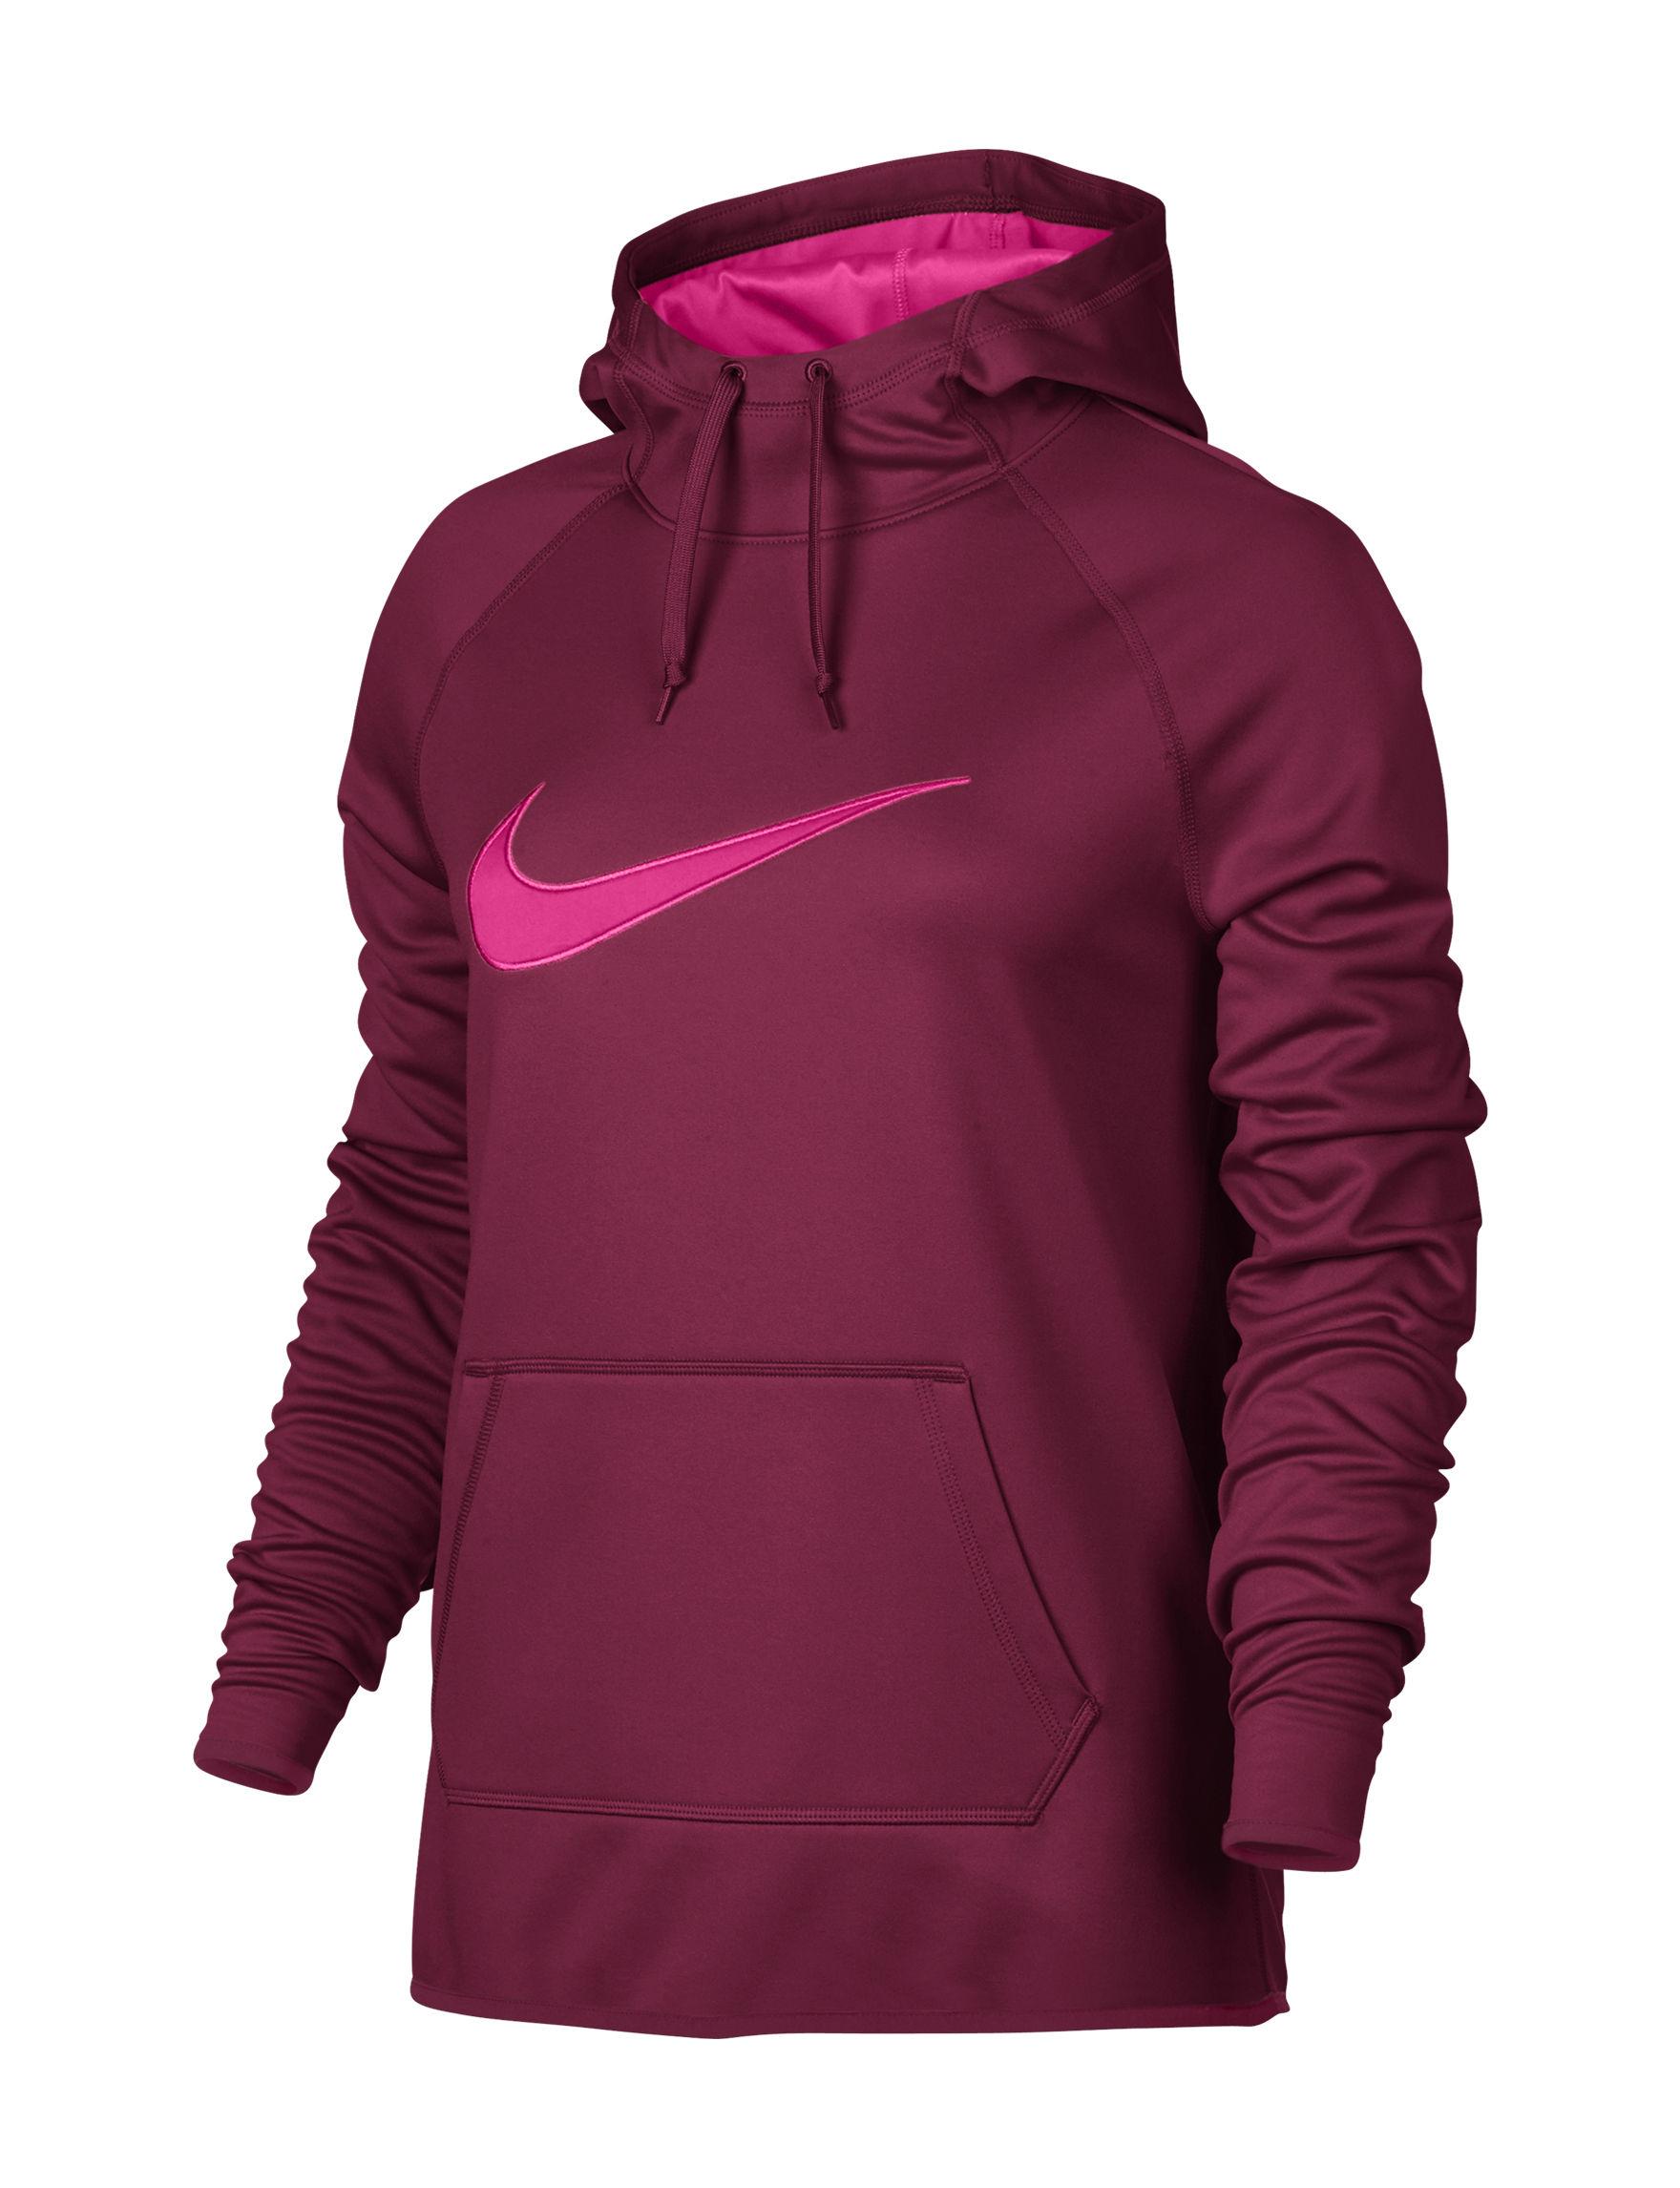 Nike Red Lightweight Jackets & Blazers